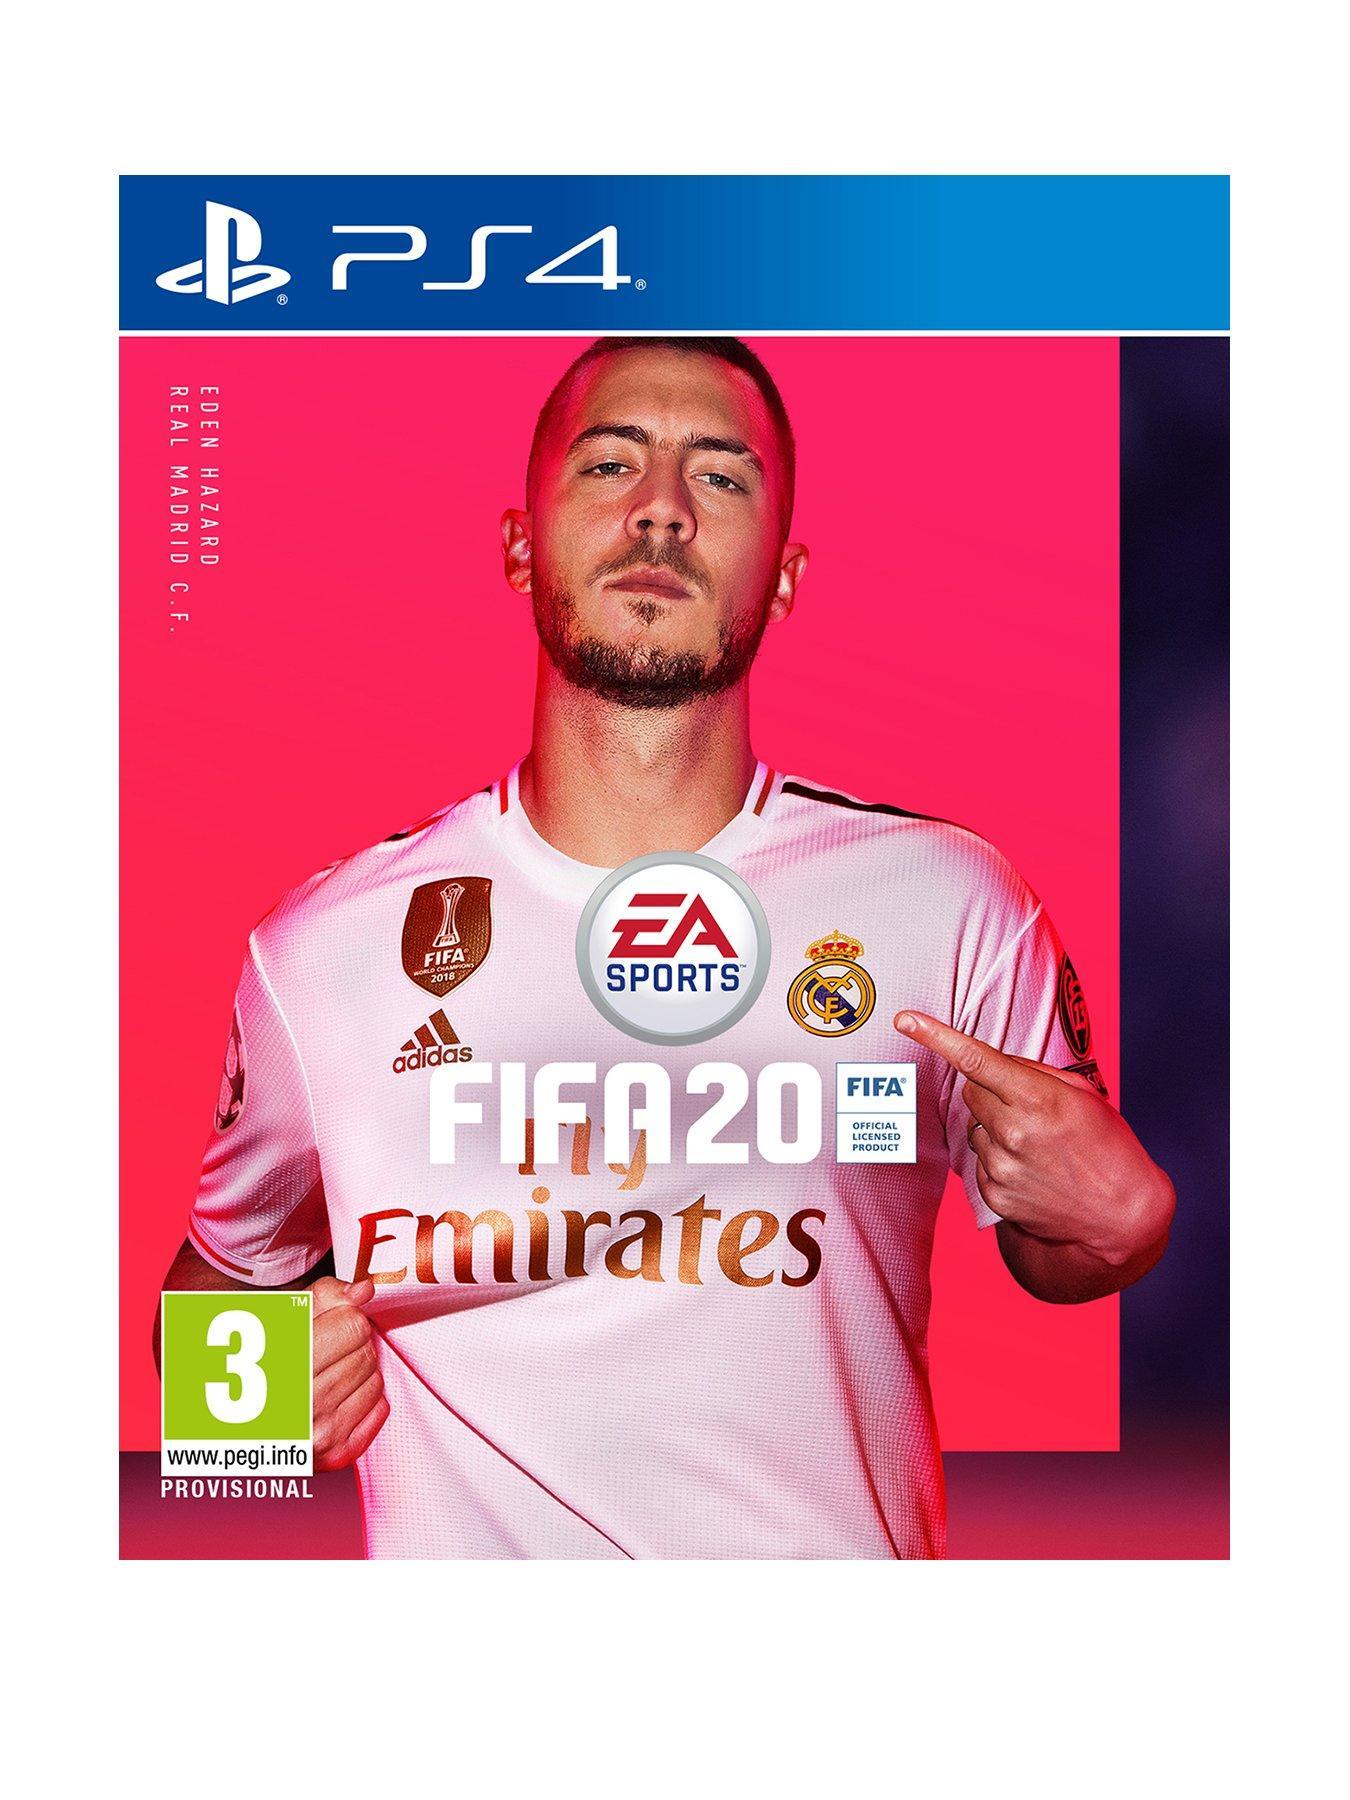 PlayStation Speed Esports Official Mens Football T Shirt